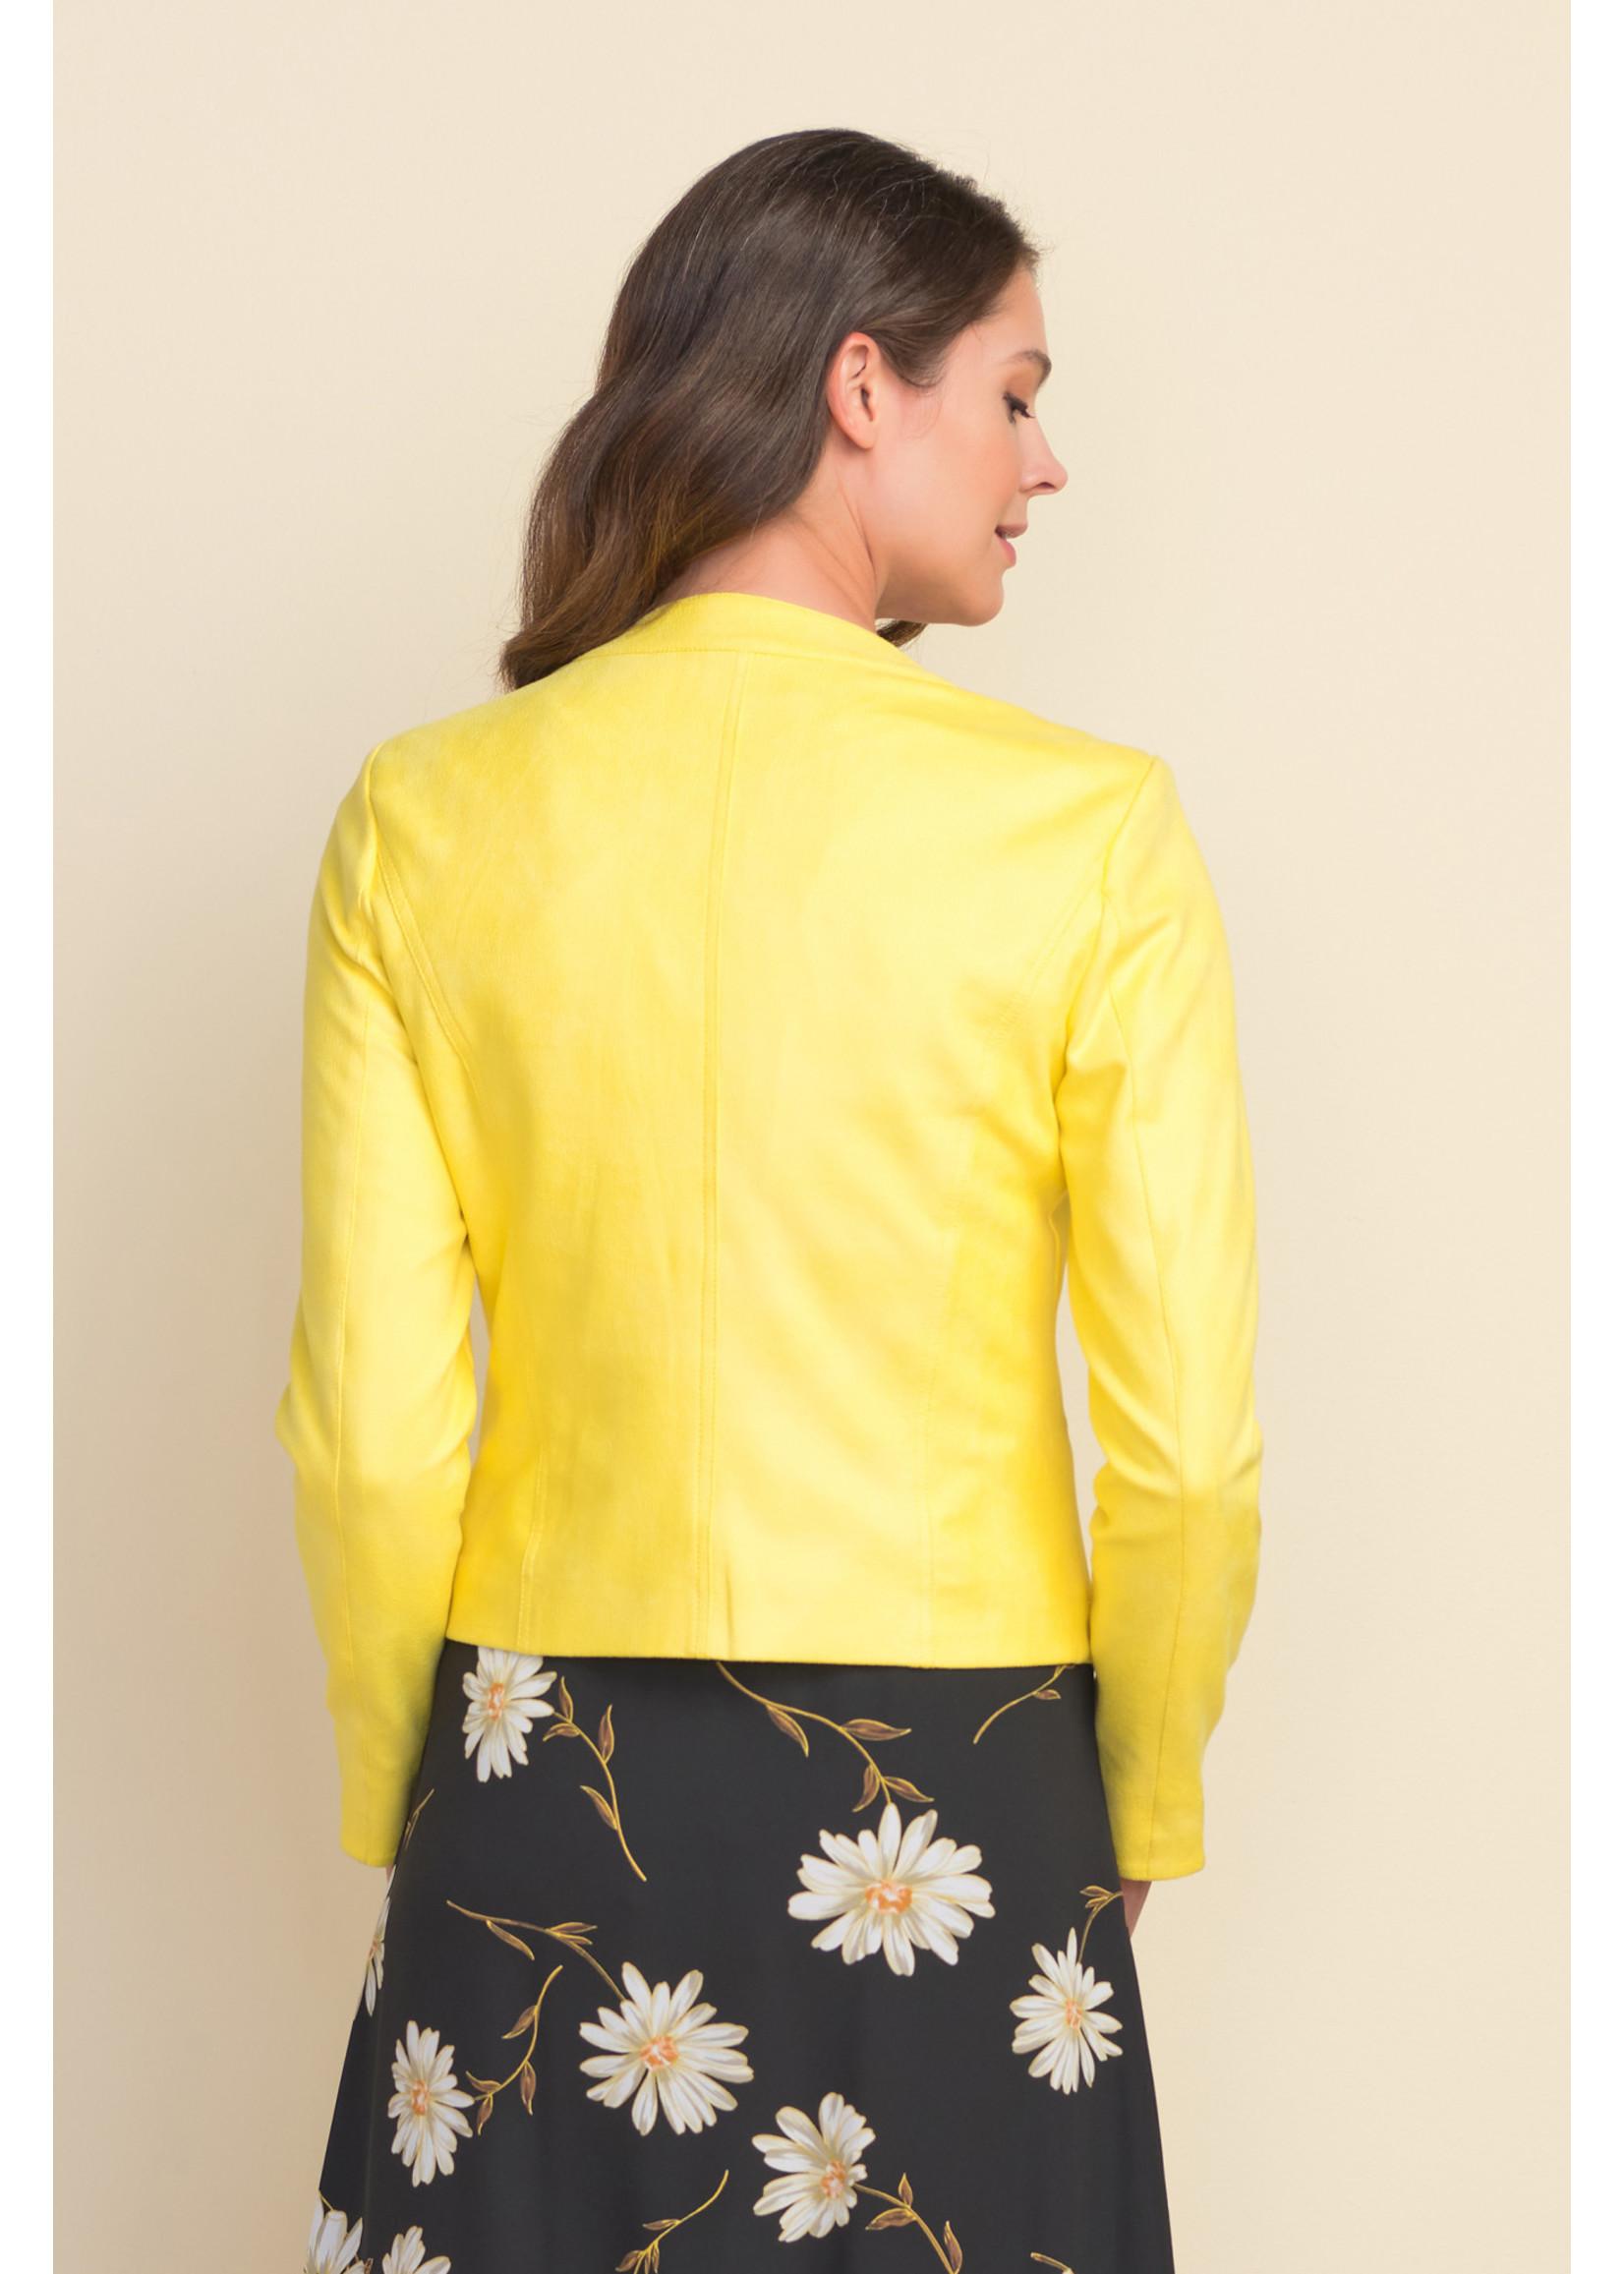 Joseph Ribkoff Lemon Zest Jacket